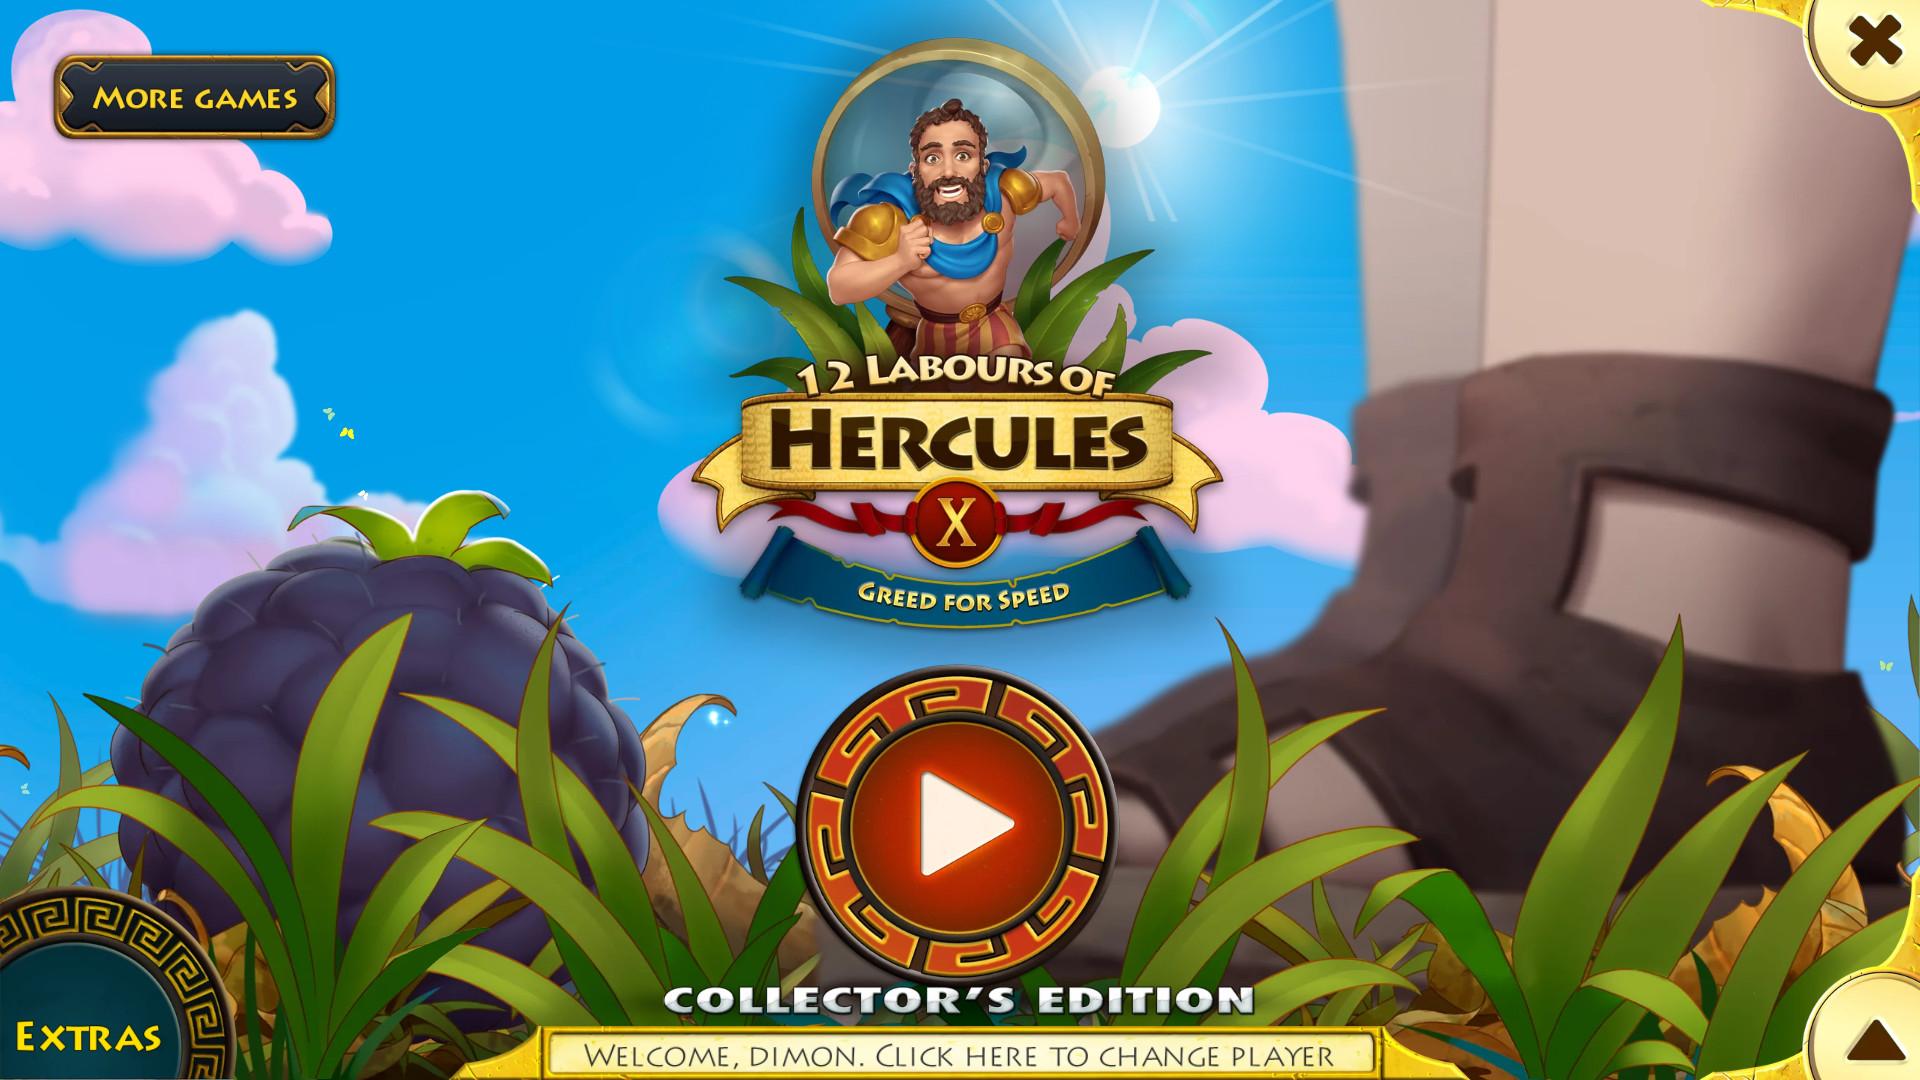 12 Labours Of Hercules Crack